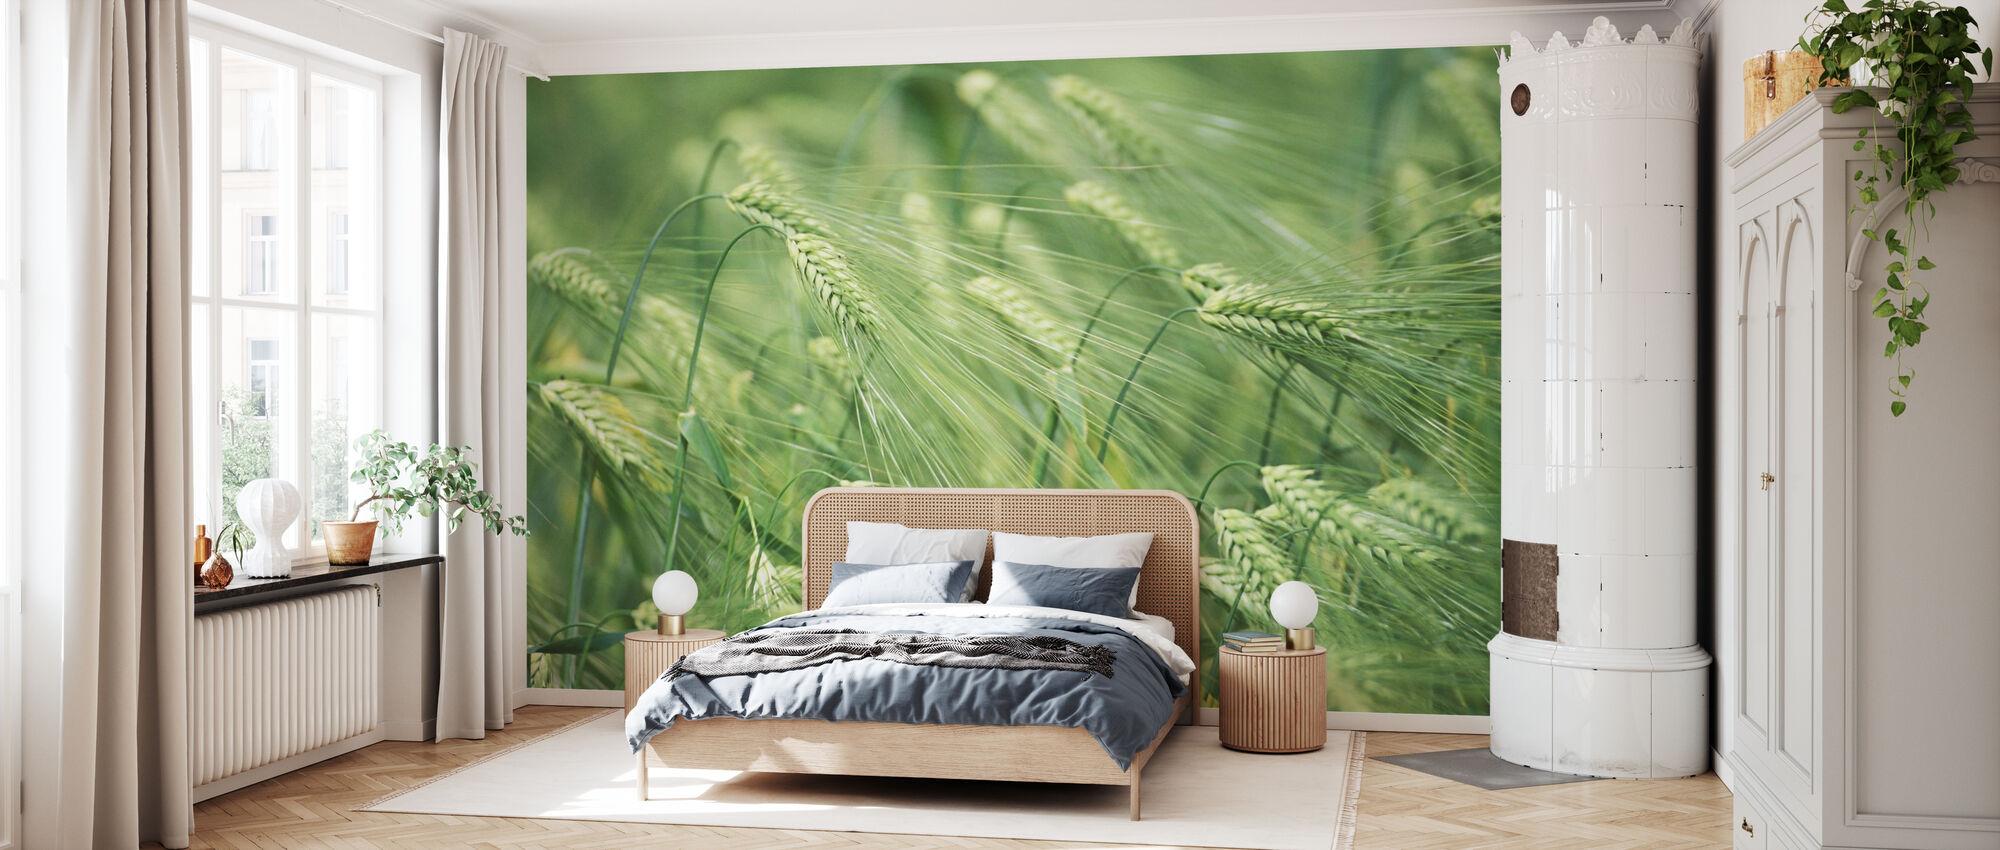 Barley Heads - Wallpaper - Bedroom